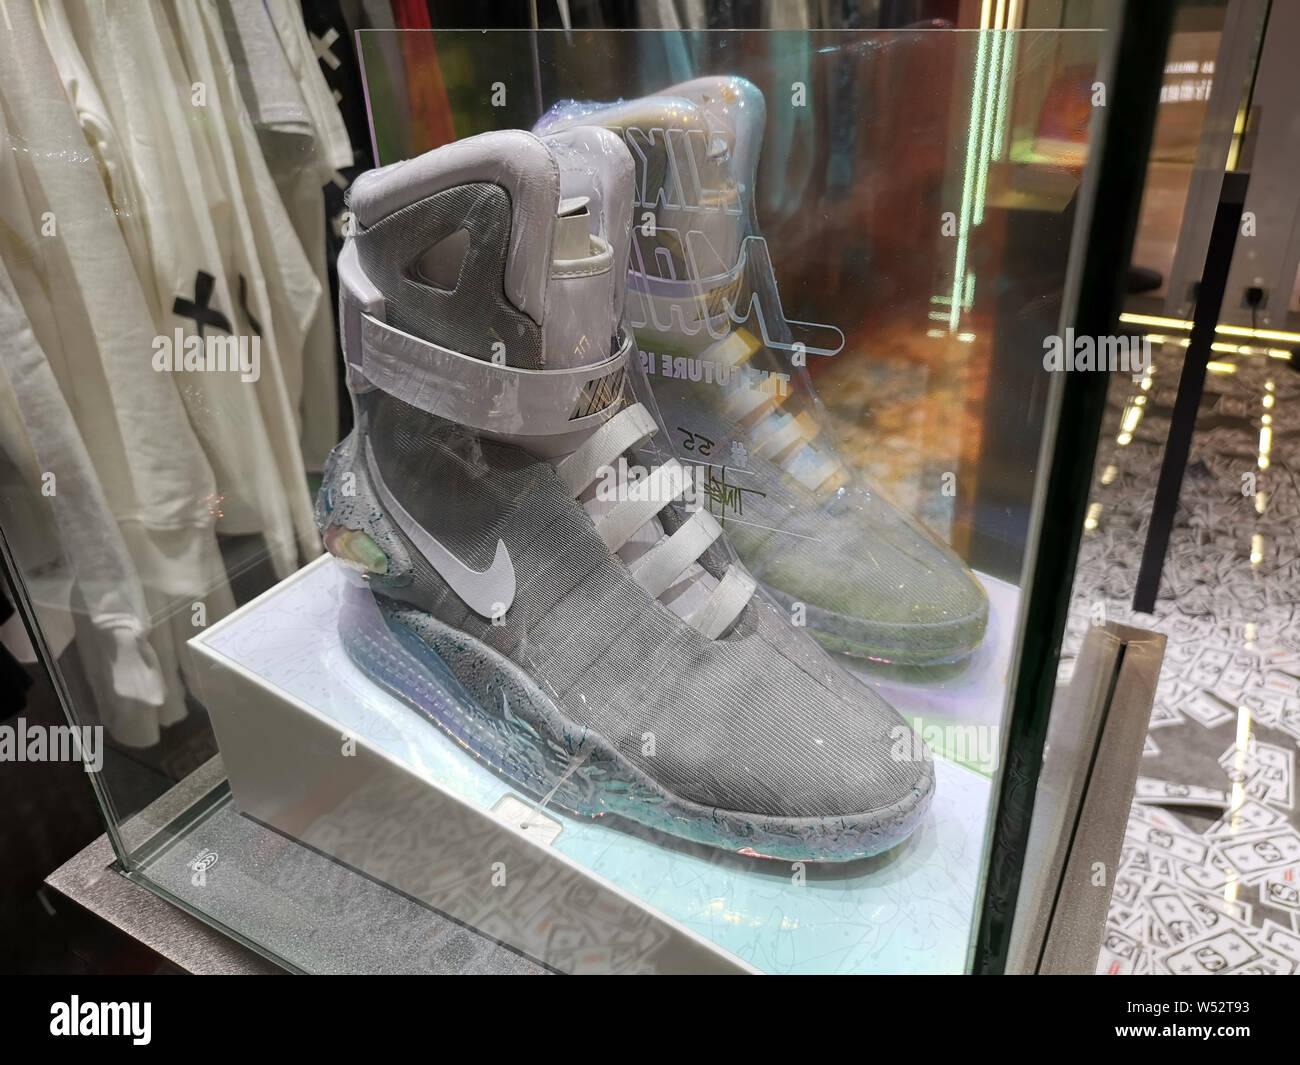 Neu Nike Central Stockfotos & Nike Central Bilder Alamy  spare mehr